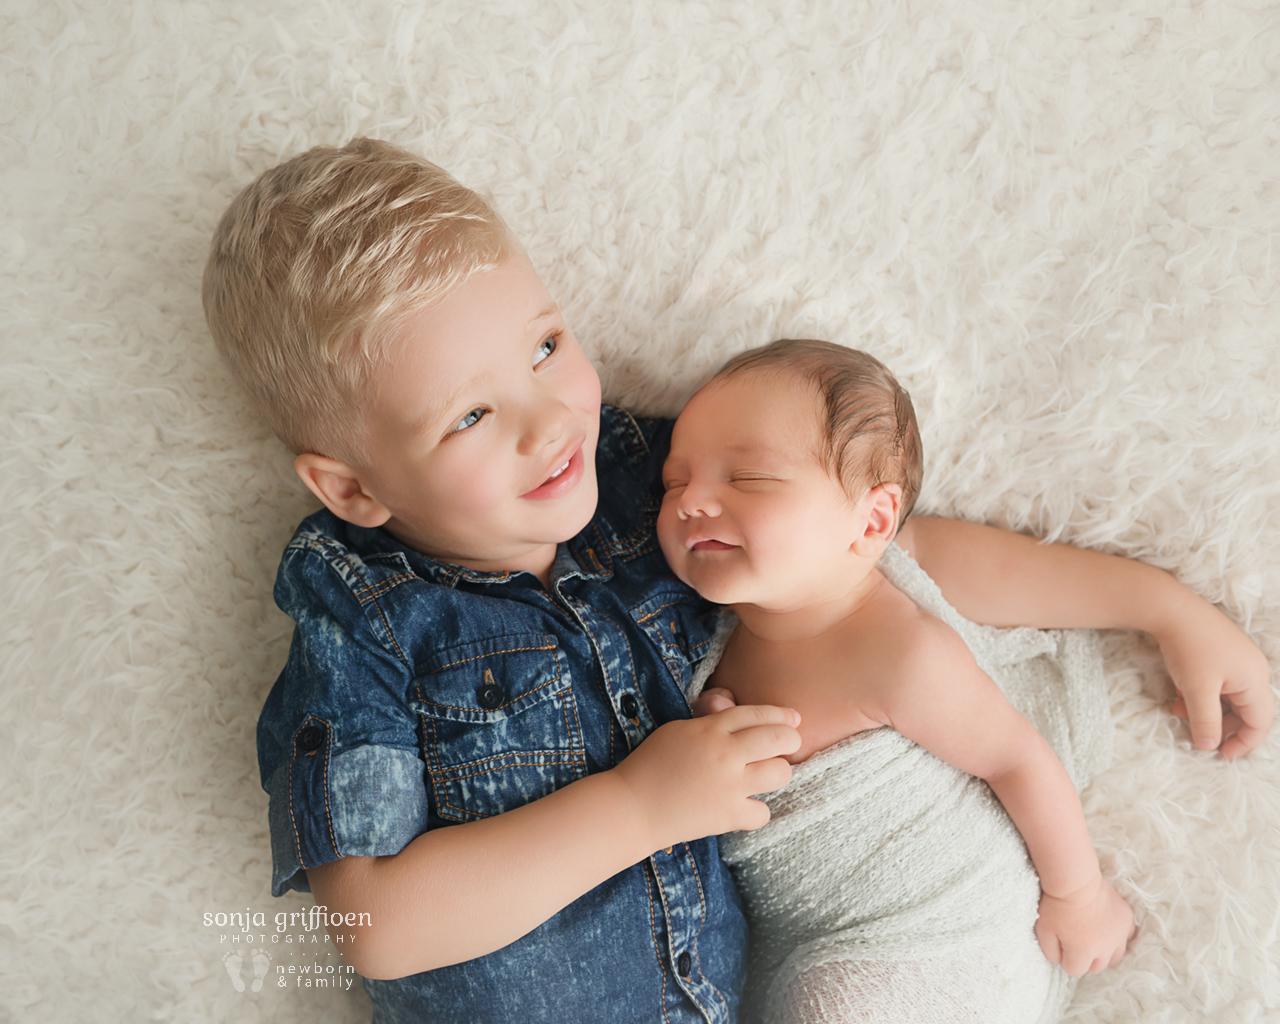 Caden-Newborn-Brisbane-Newborn-Photographer-Sonja-Griffioen-04.jpg